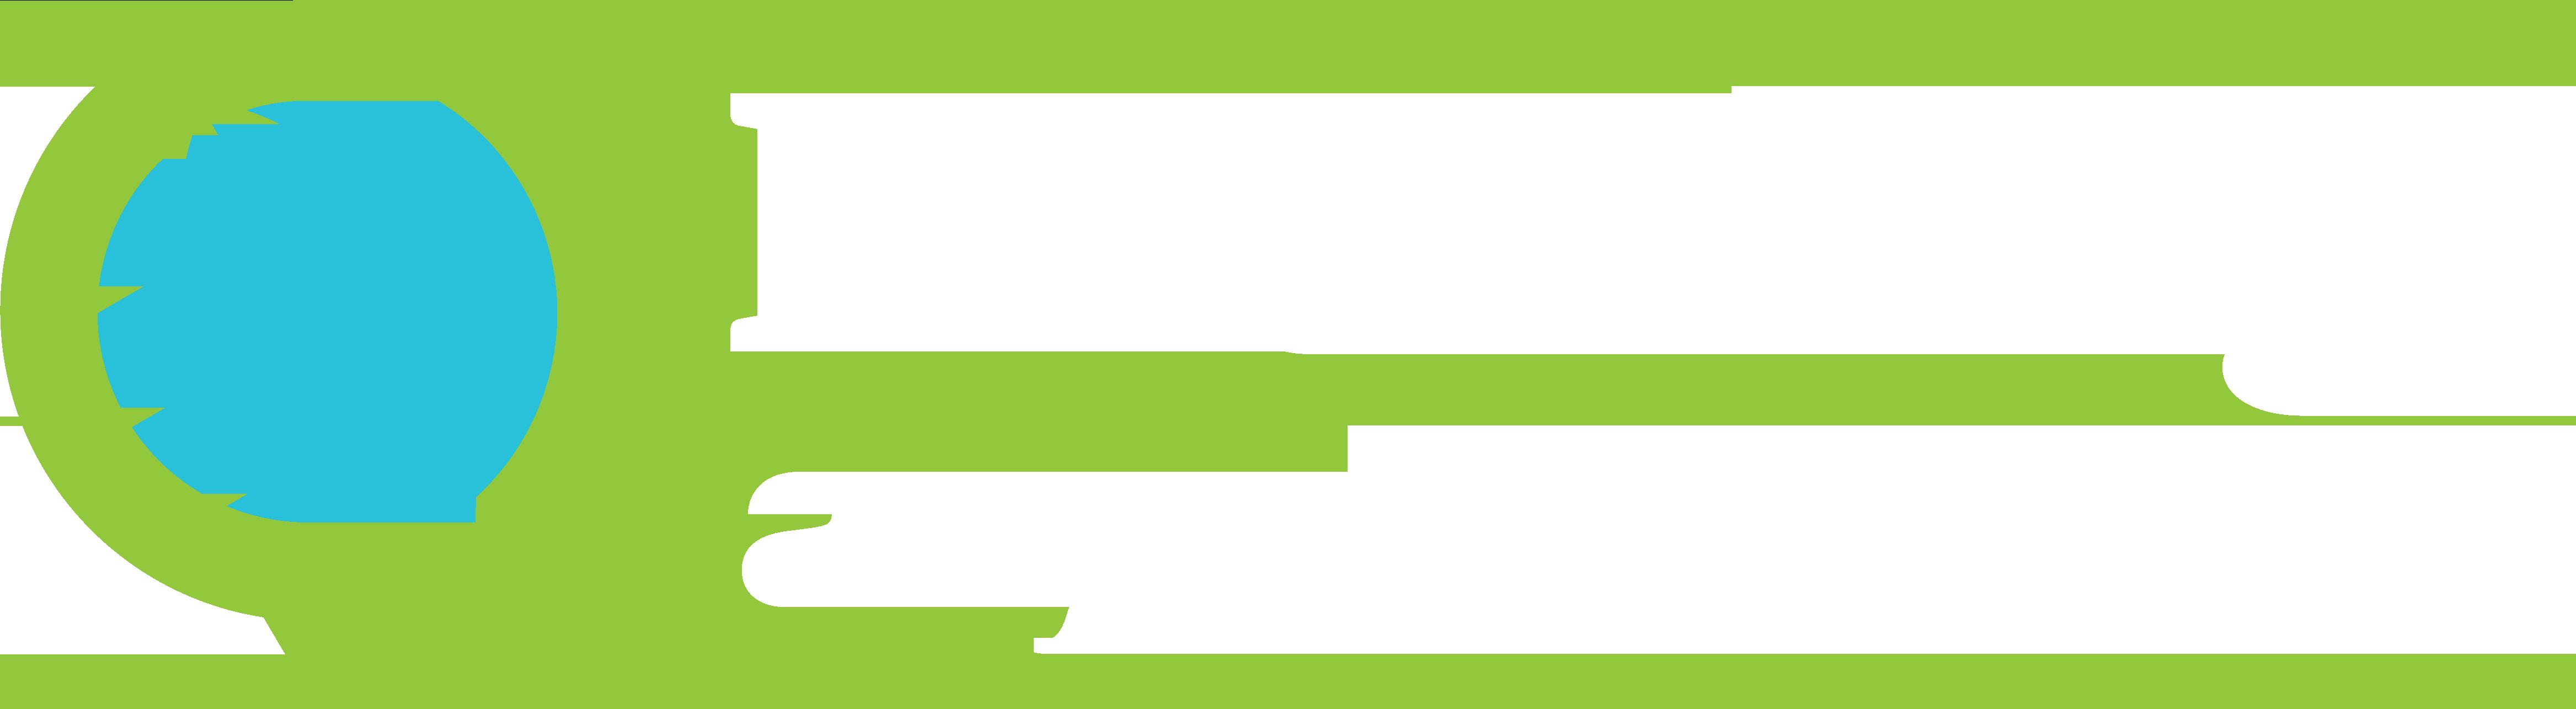 Scormify - Easily convert your content into SCORM compliant